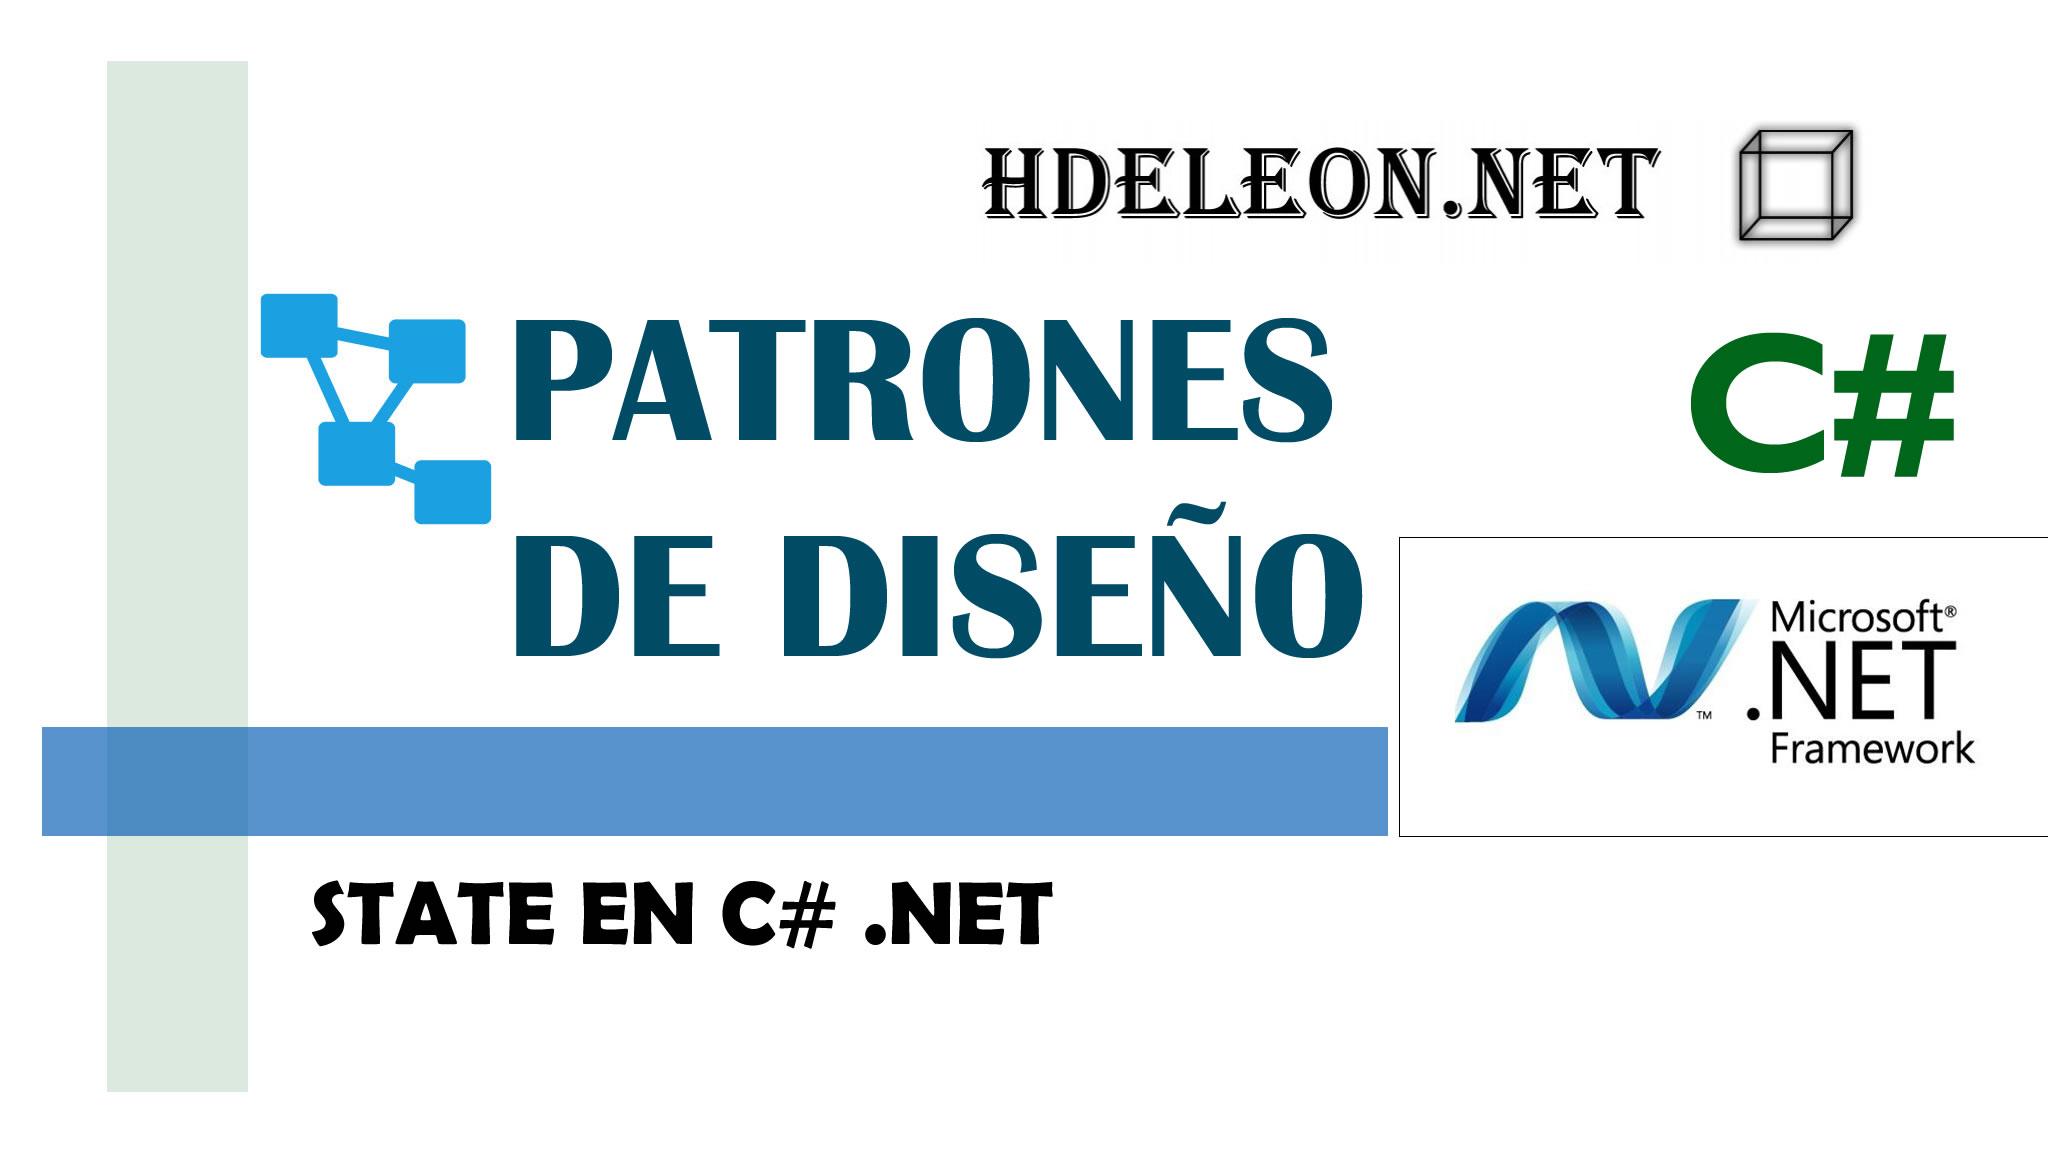 State en C# .Net, Patrones de diseño, design patterns #7